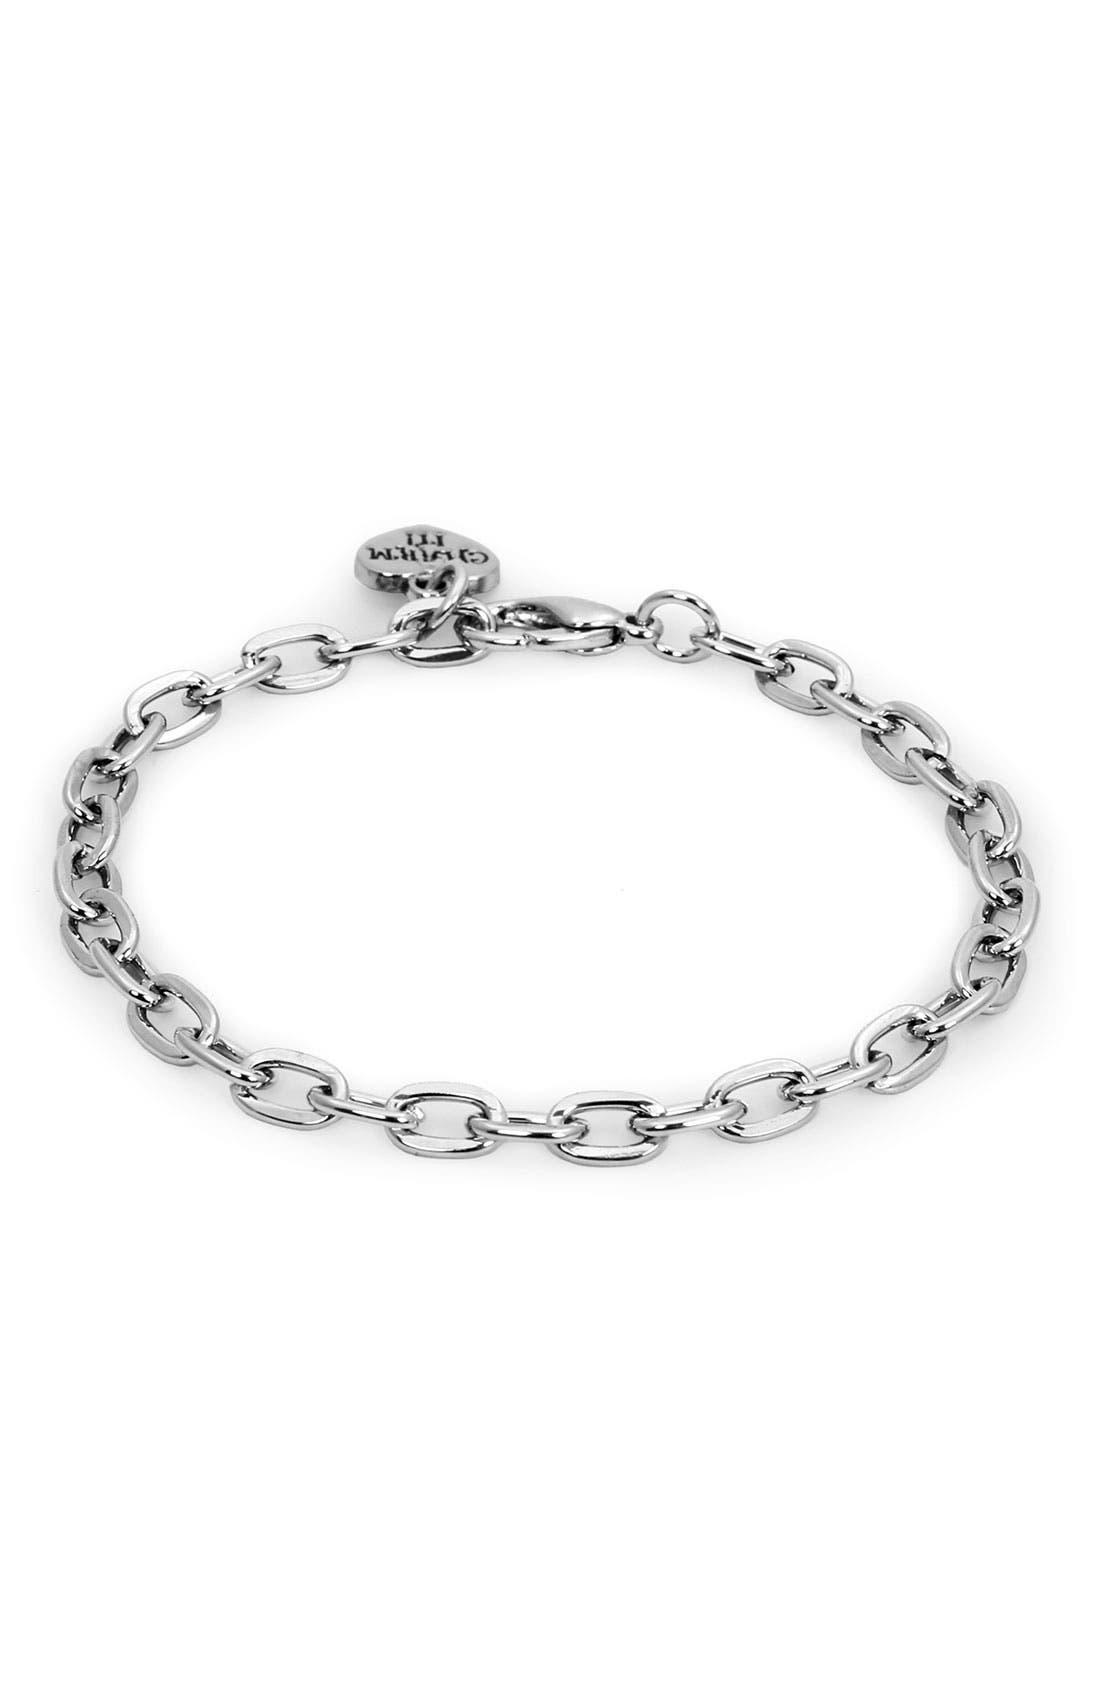 Alternate Image 1 Selected - CHARM IT!® Charm Bracelet (Girls)